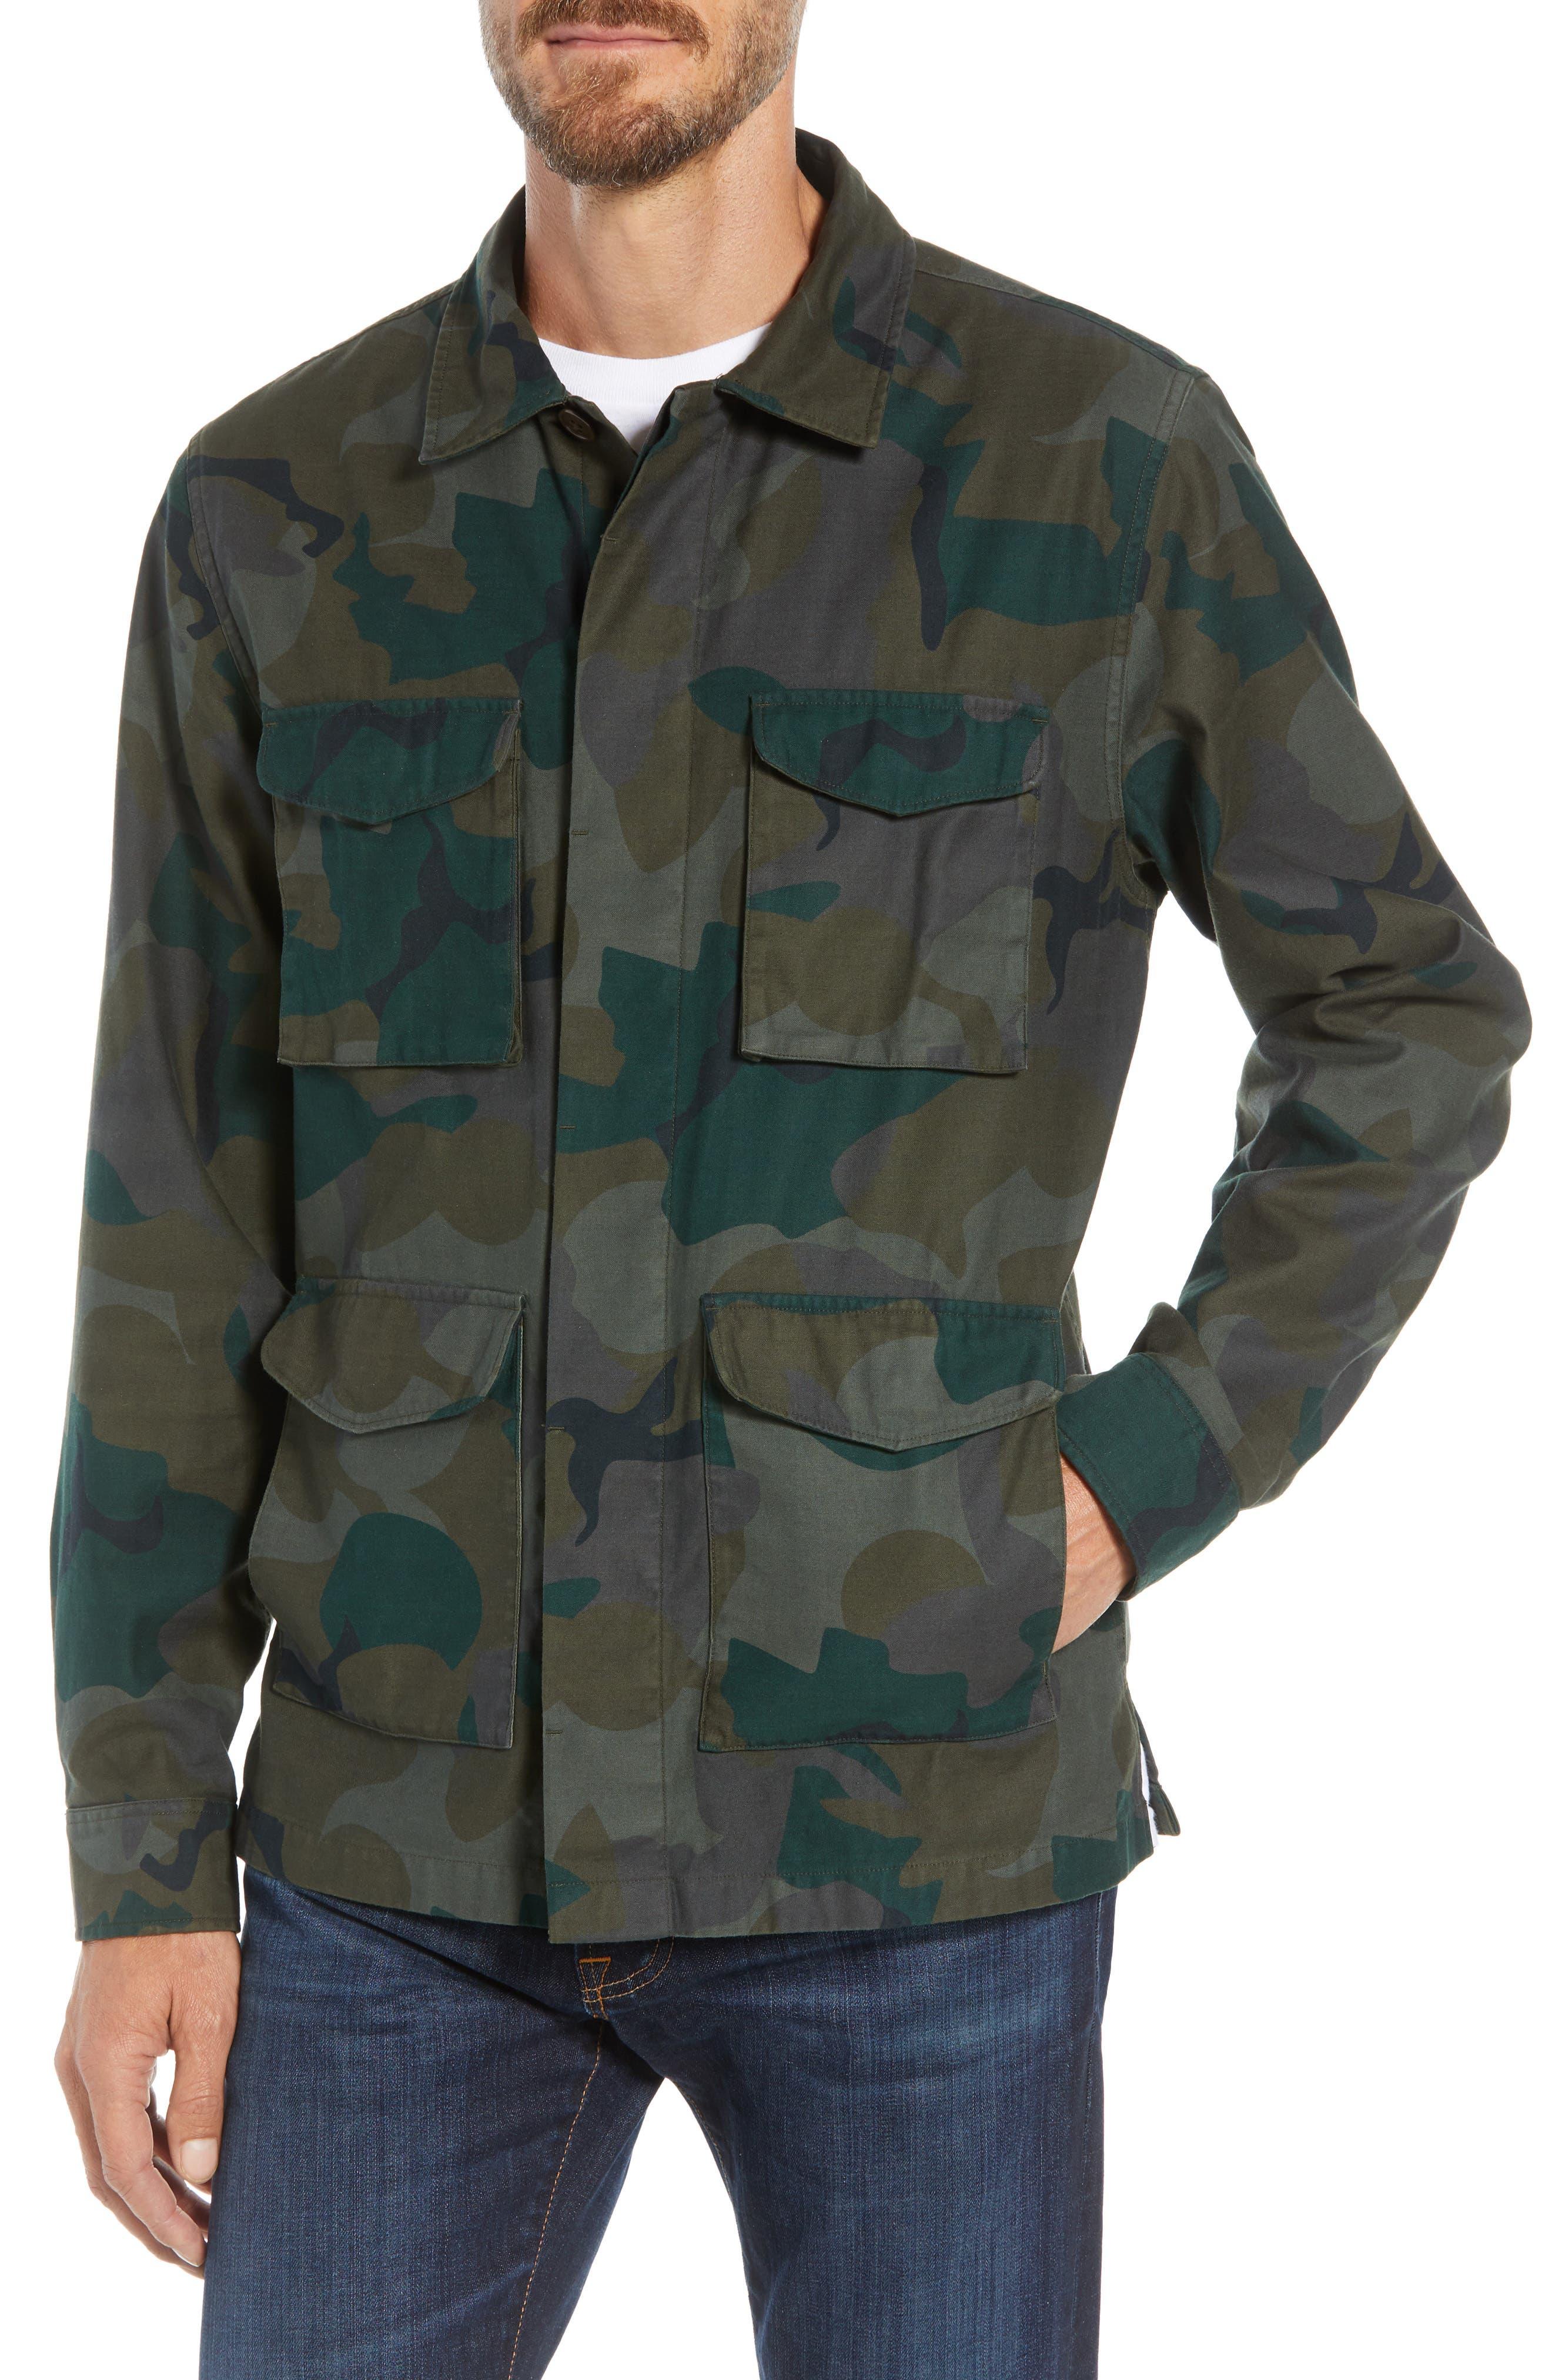 Four-Pocket Military Jacket,                             Alternate thumbnail 4, color,                             301